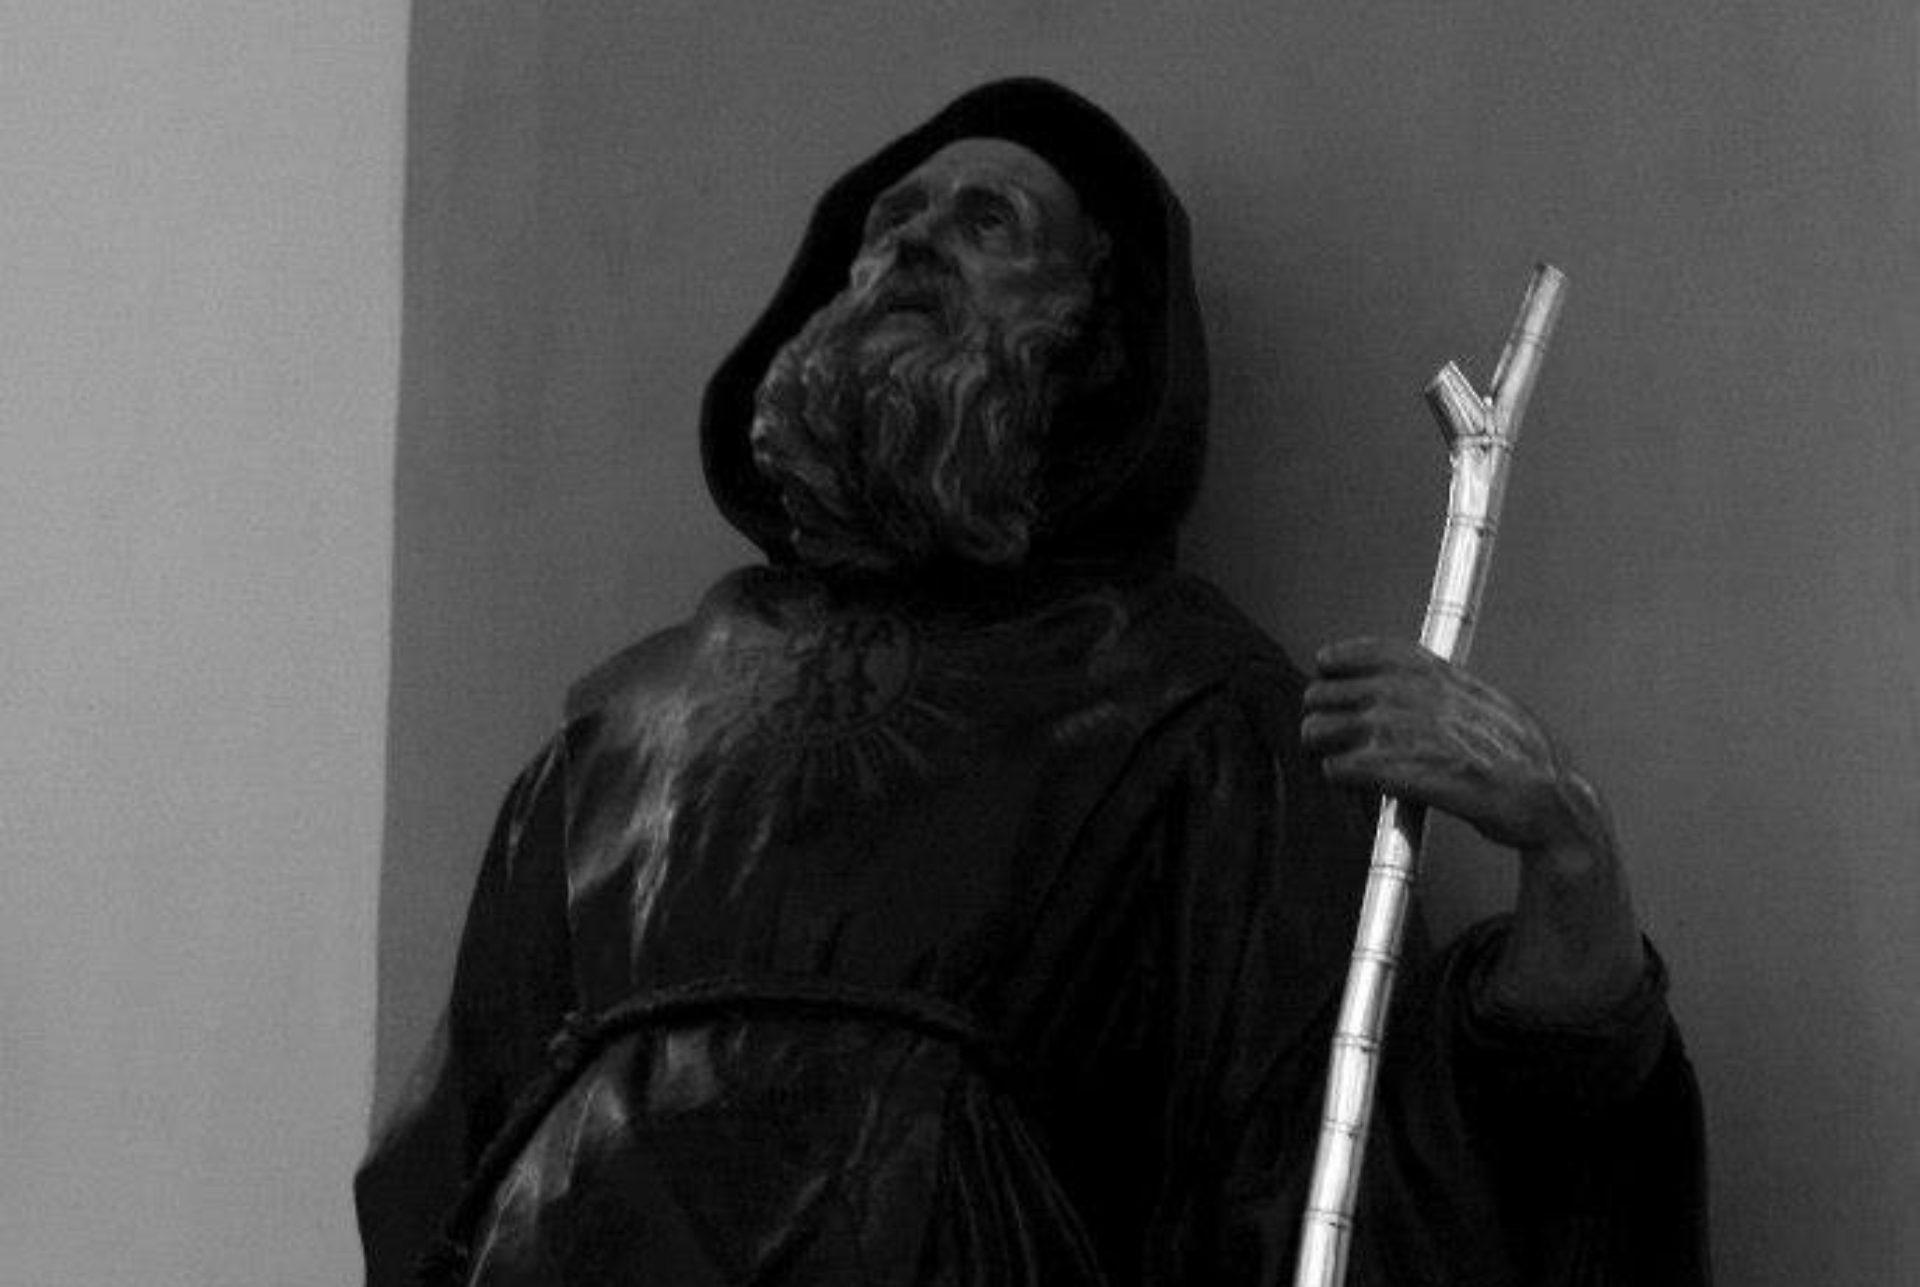 Parrocchia San Francesco di Paola